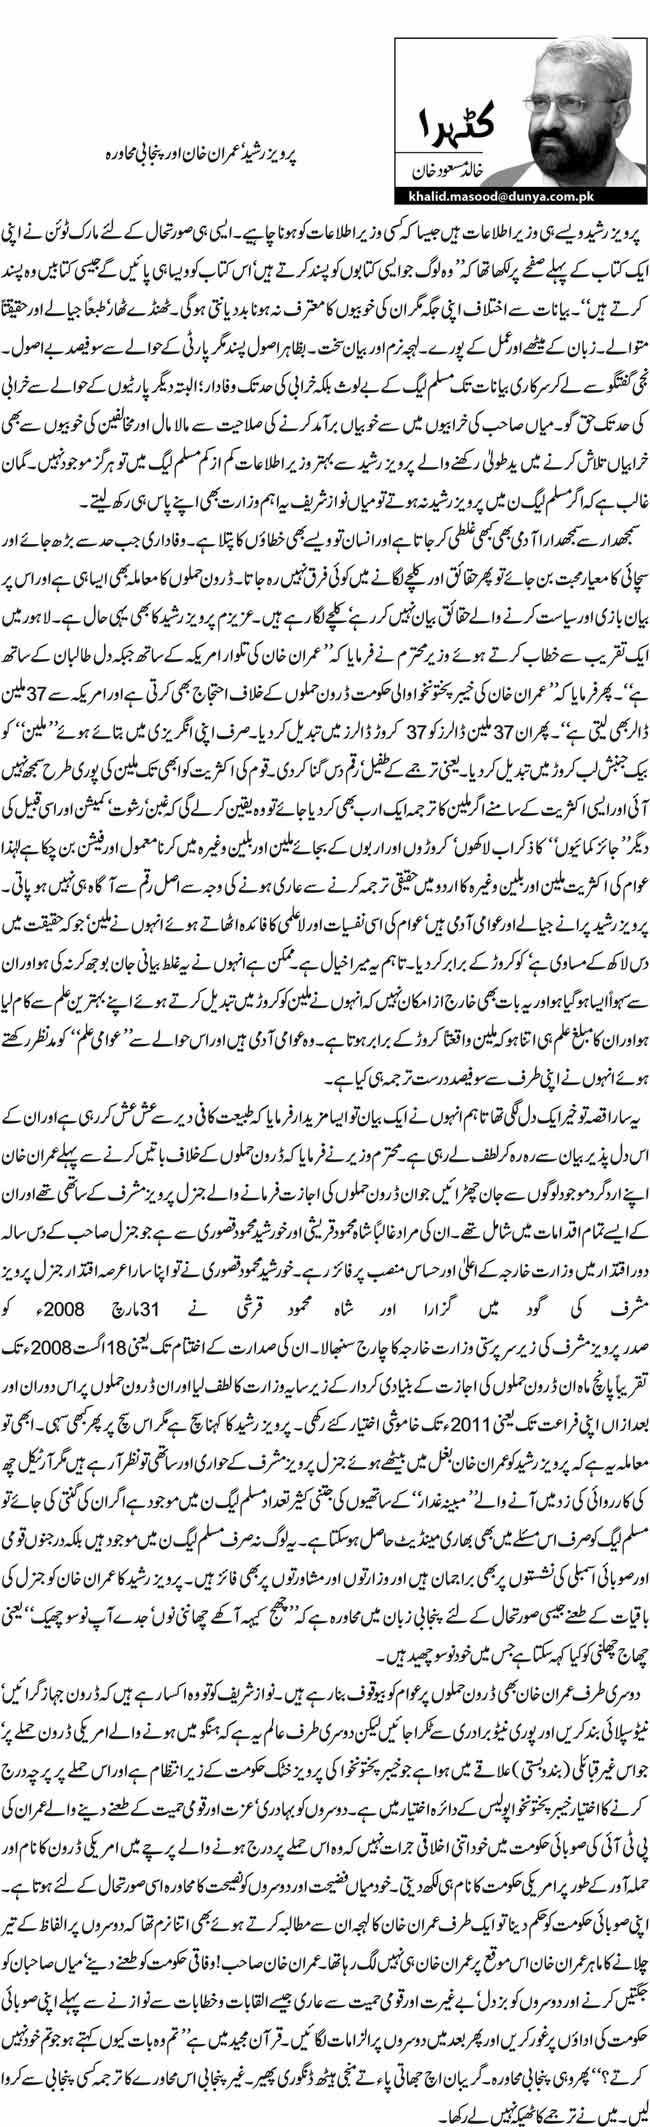 پرویز رشید' عمران خان اور پنجابی محاورہ